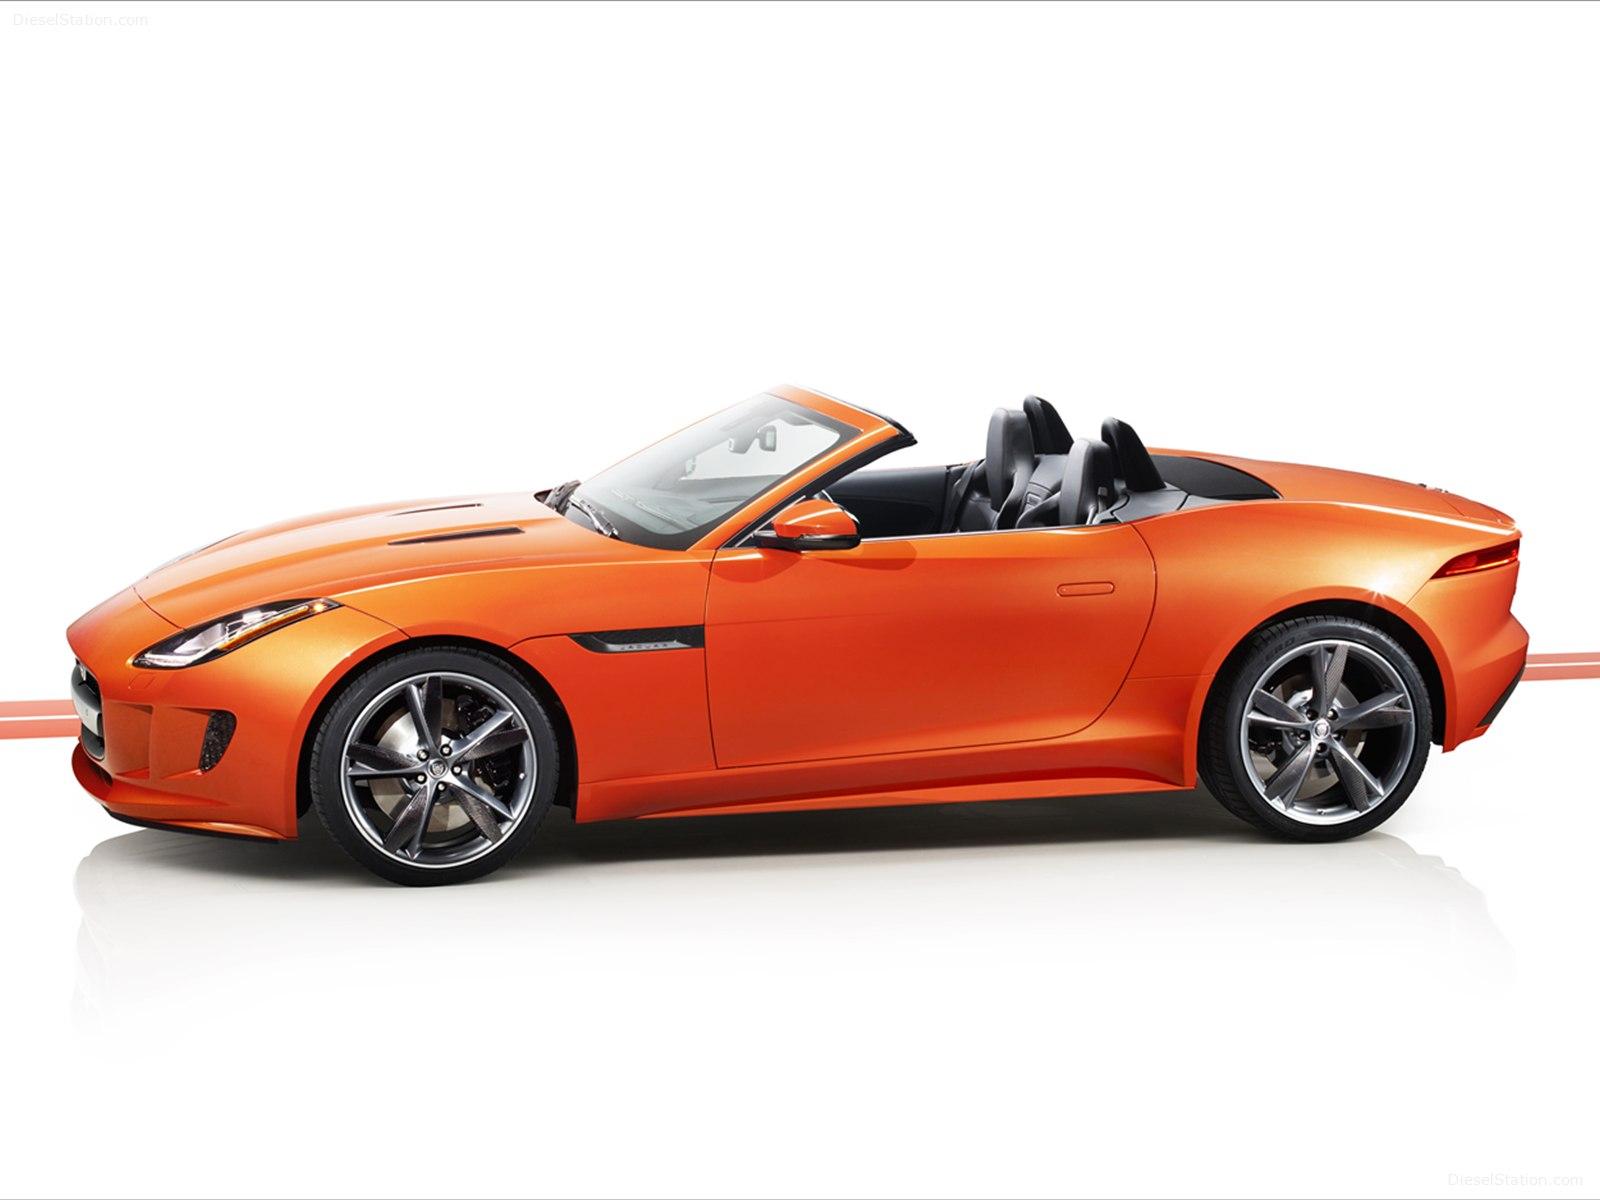 Jaguar-F-Type-Firesand-2013-05.jpg